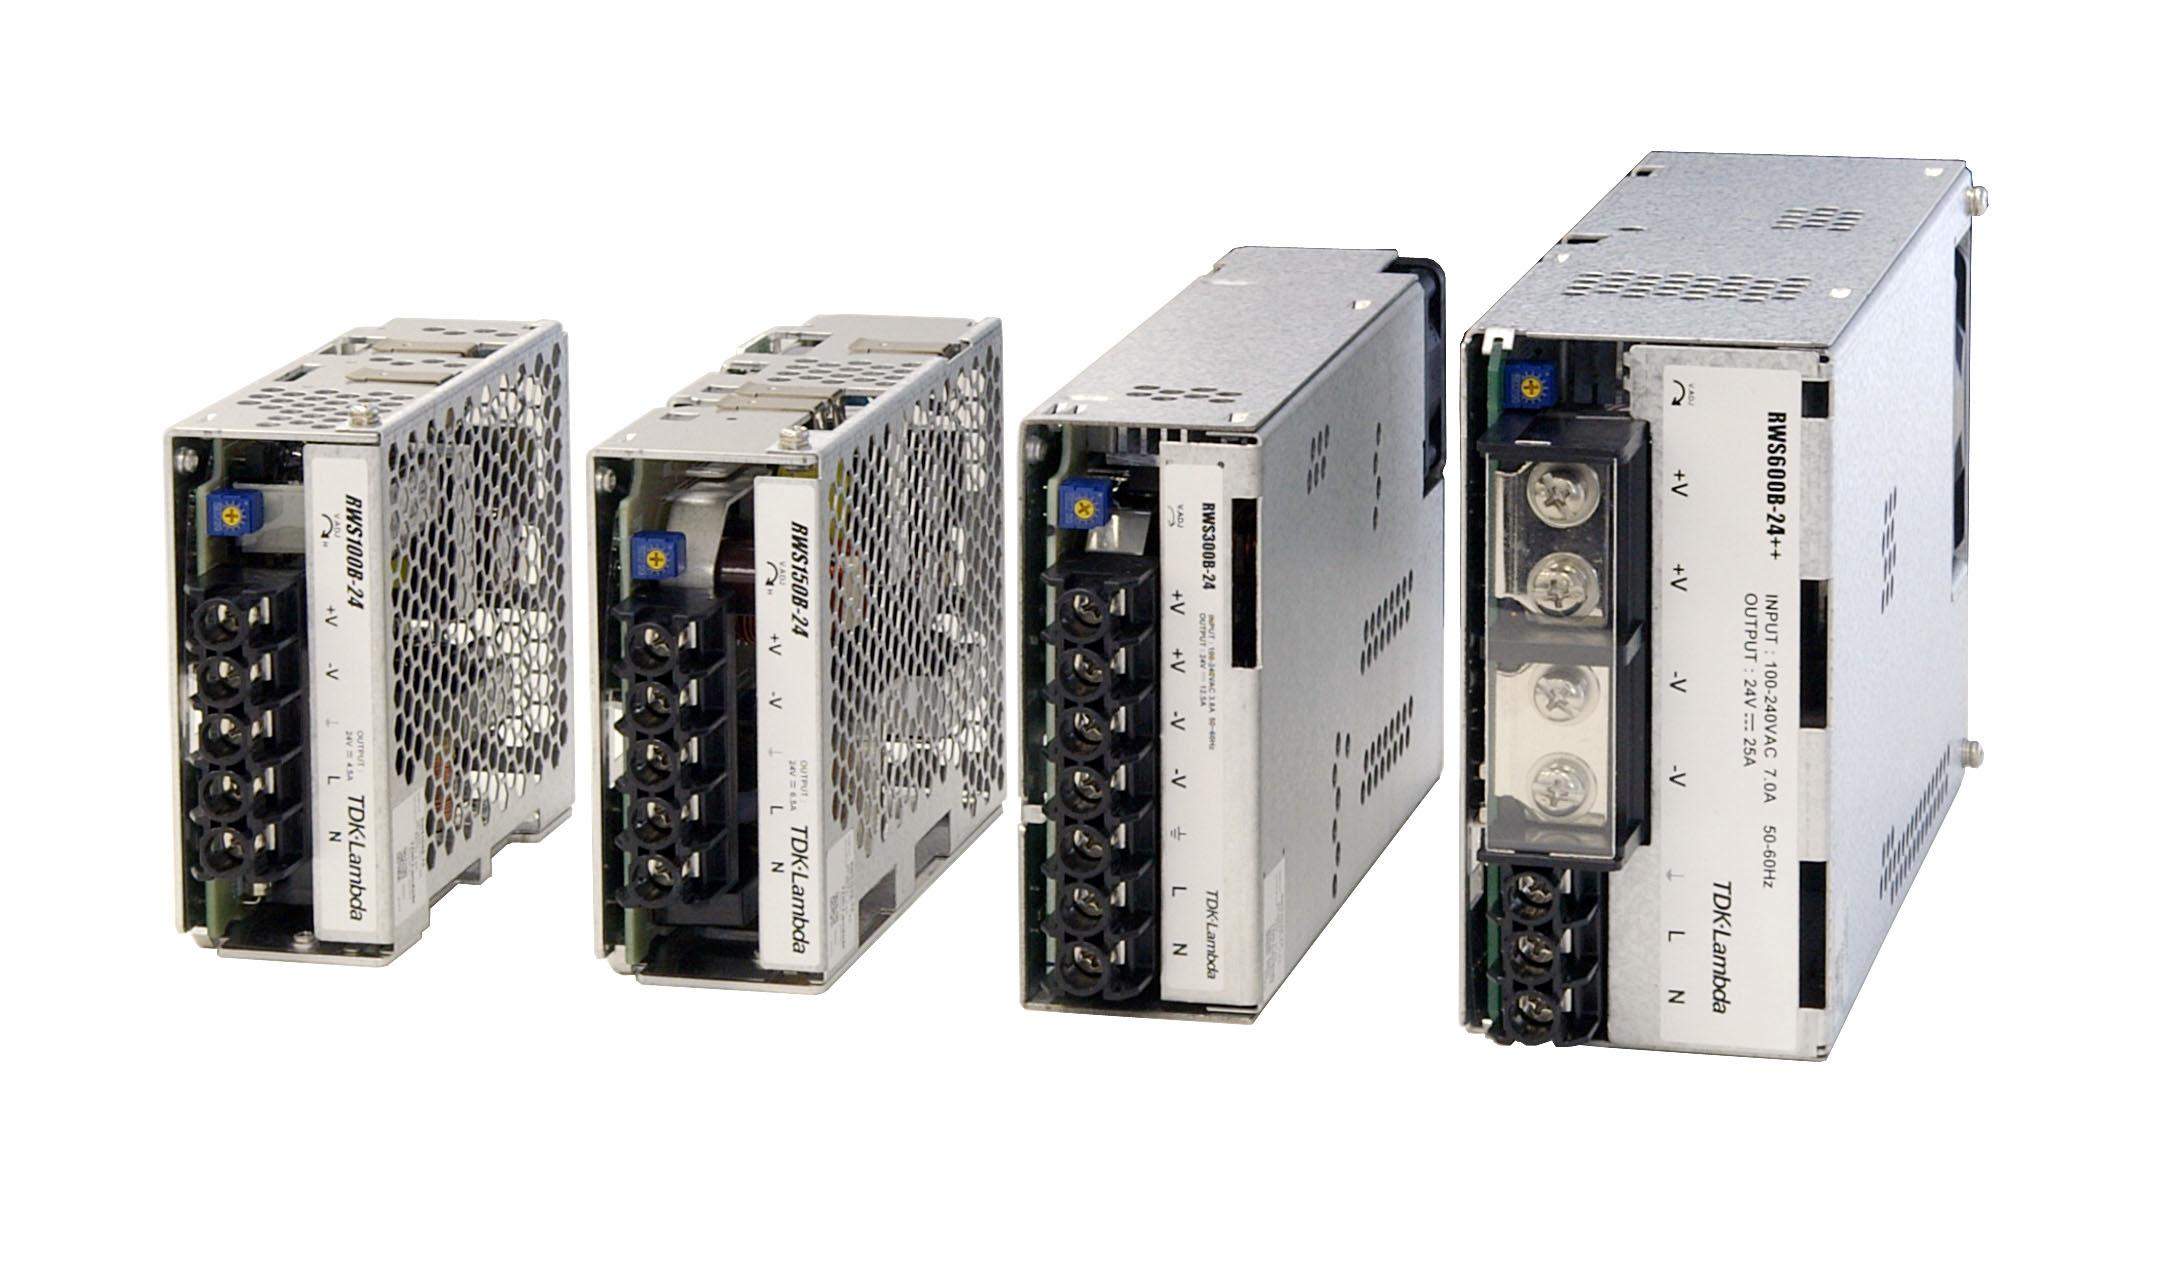 Rws150b 24 Tdk Lambda Open Enclosed Frame Ac Dc Power Supplies Supply Volts To 156 W Single Output Vdc65